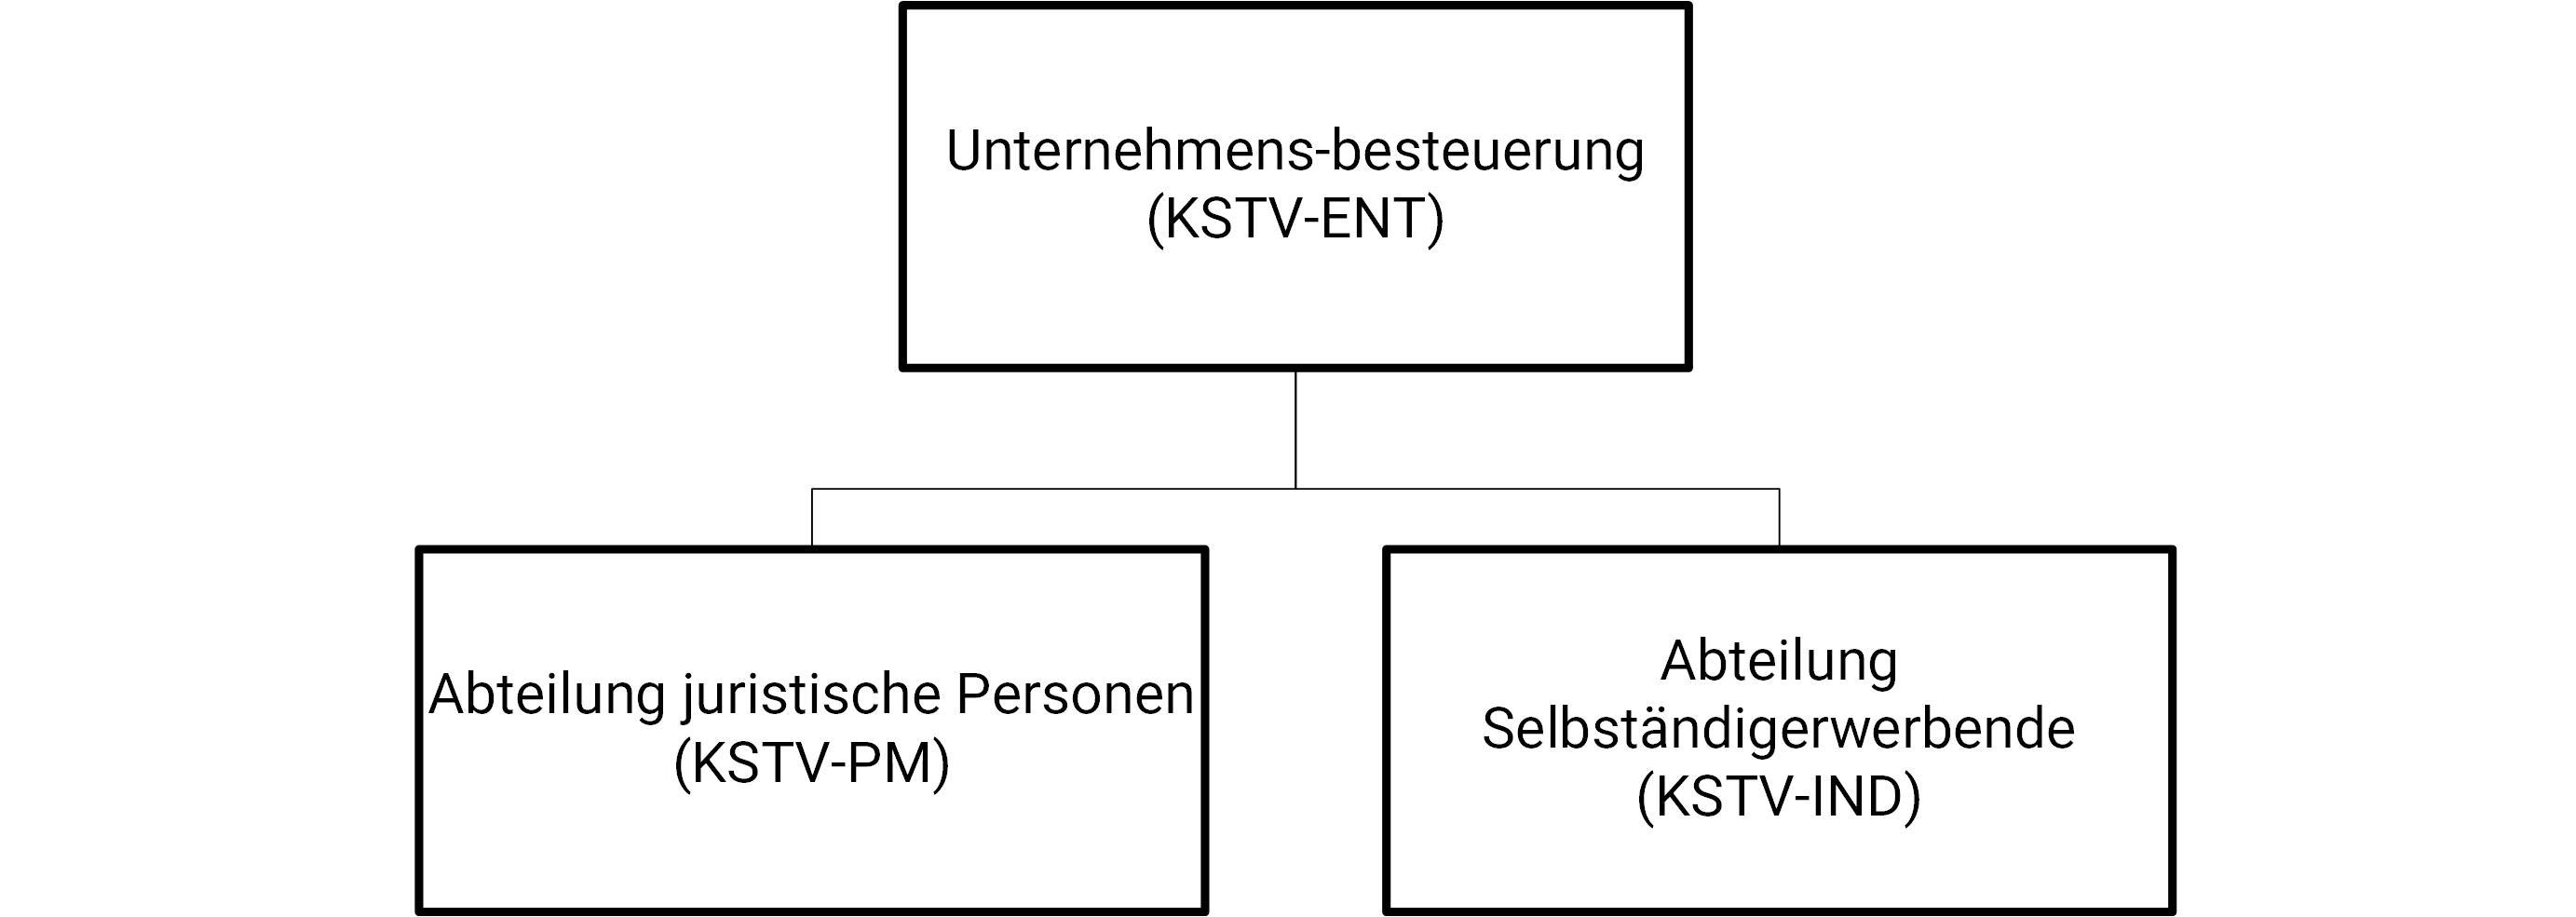 Organigramm KSTV-ENT